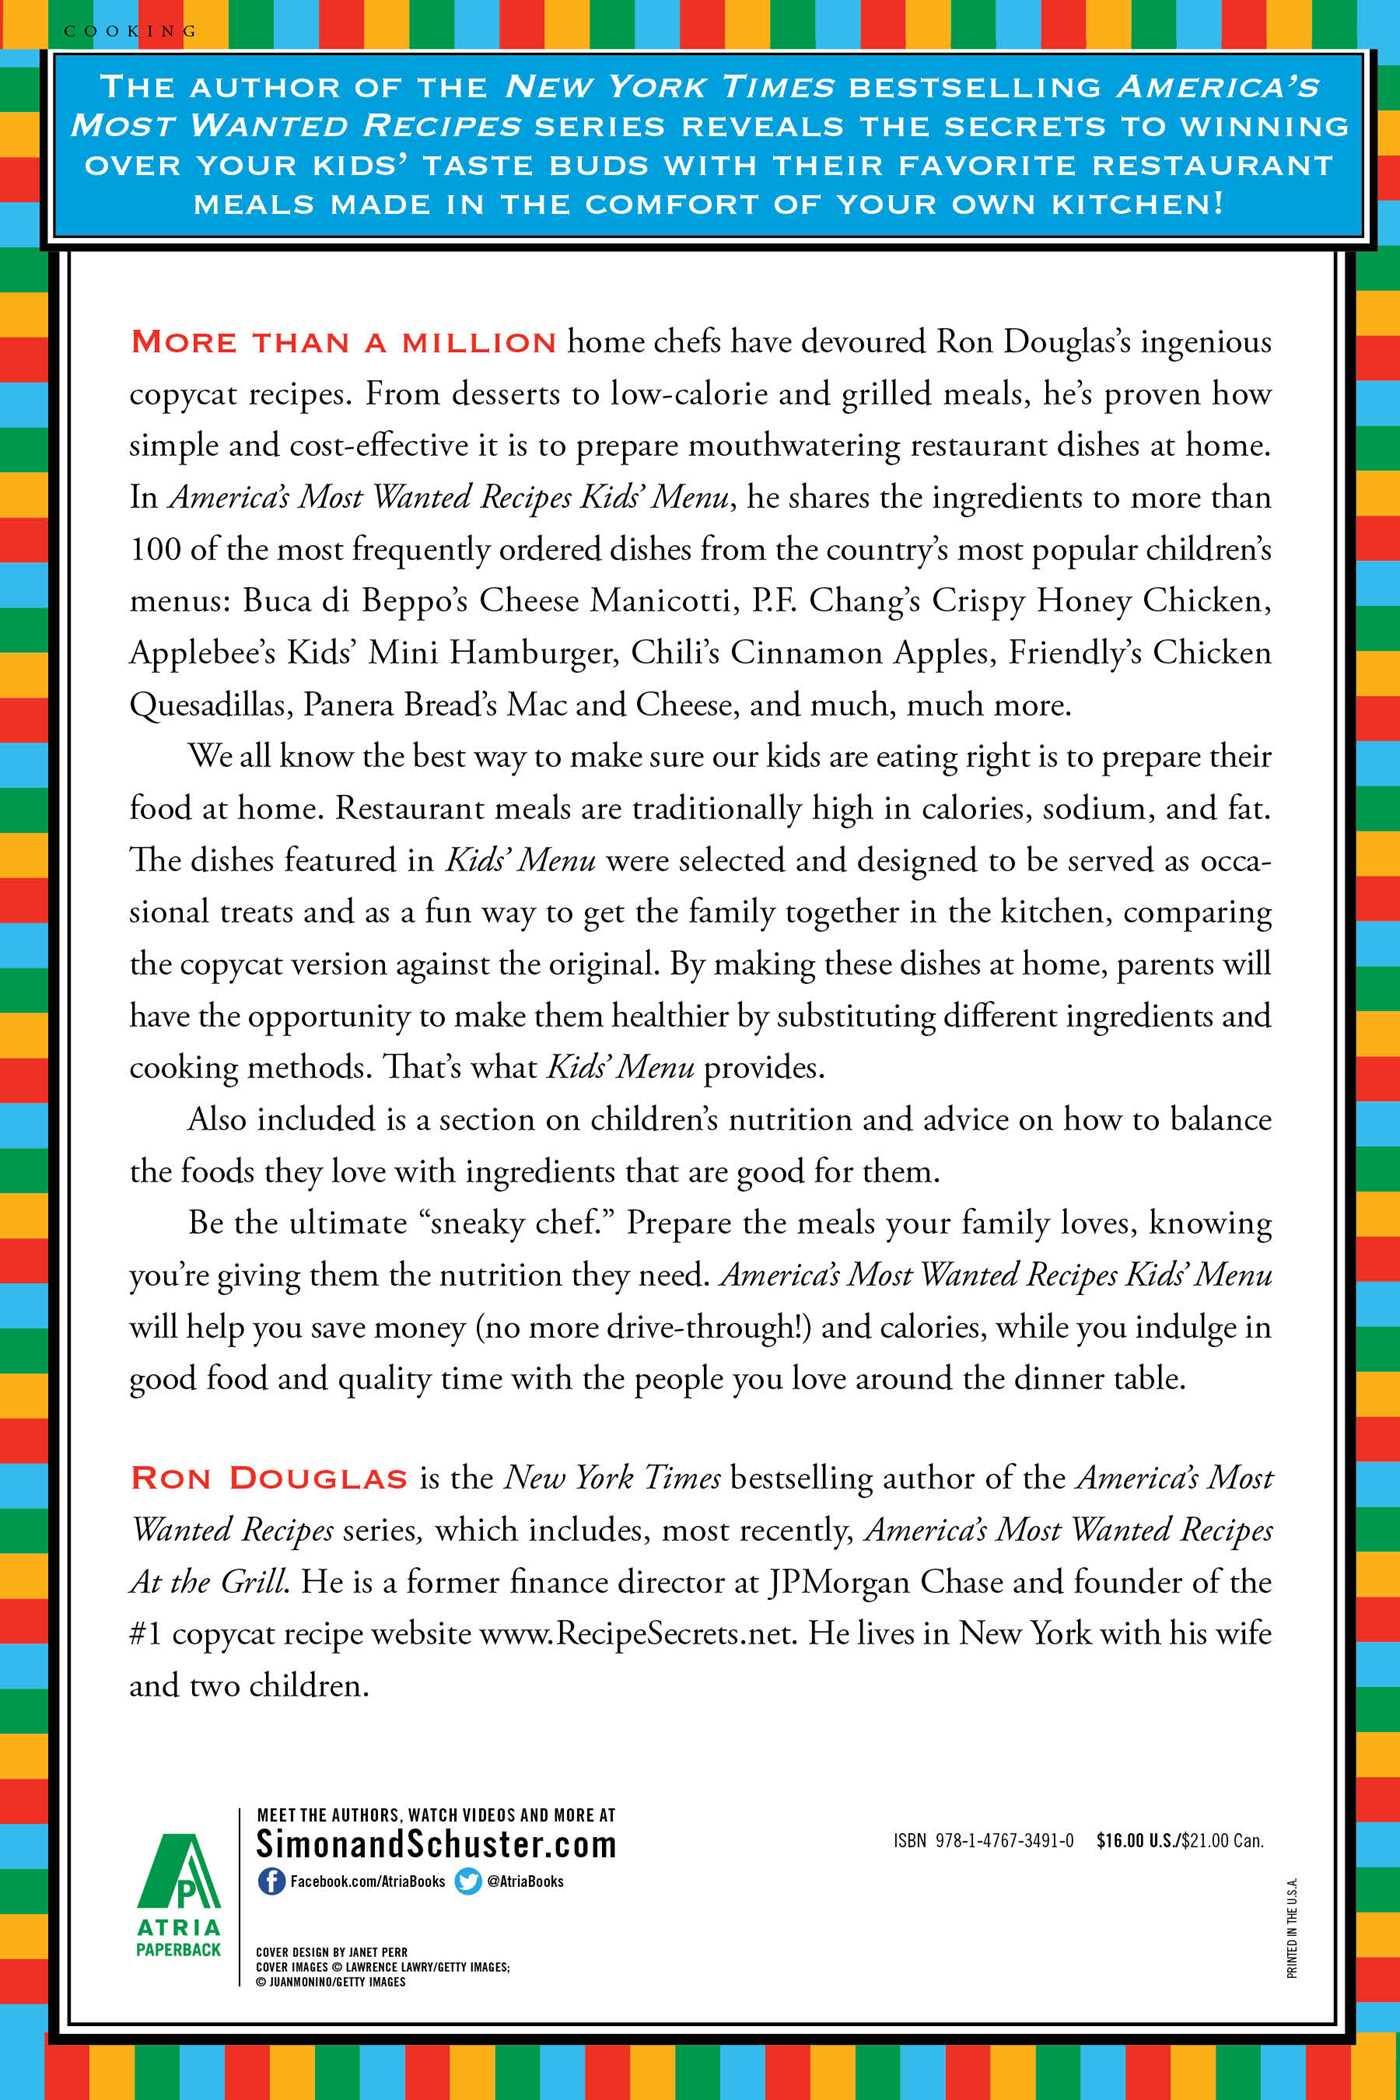 Americas most wanted recipes kids menu 9781476734910 hr back